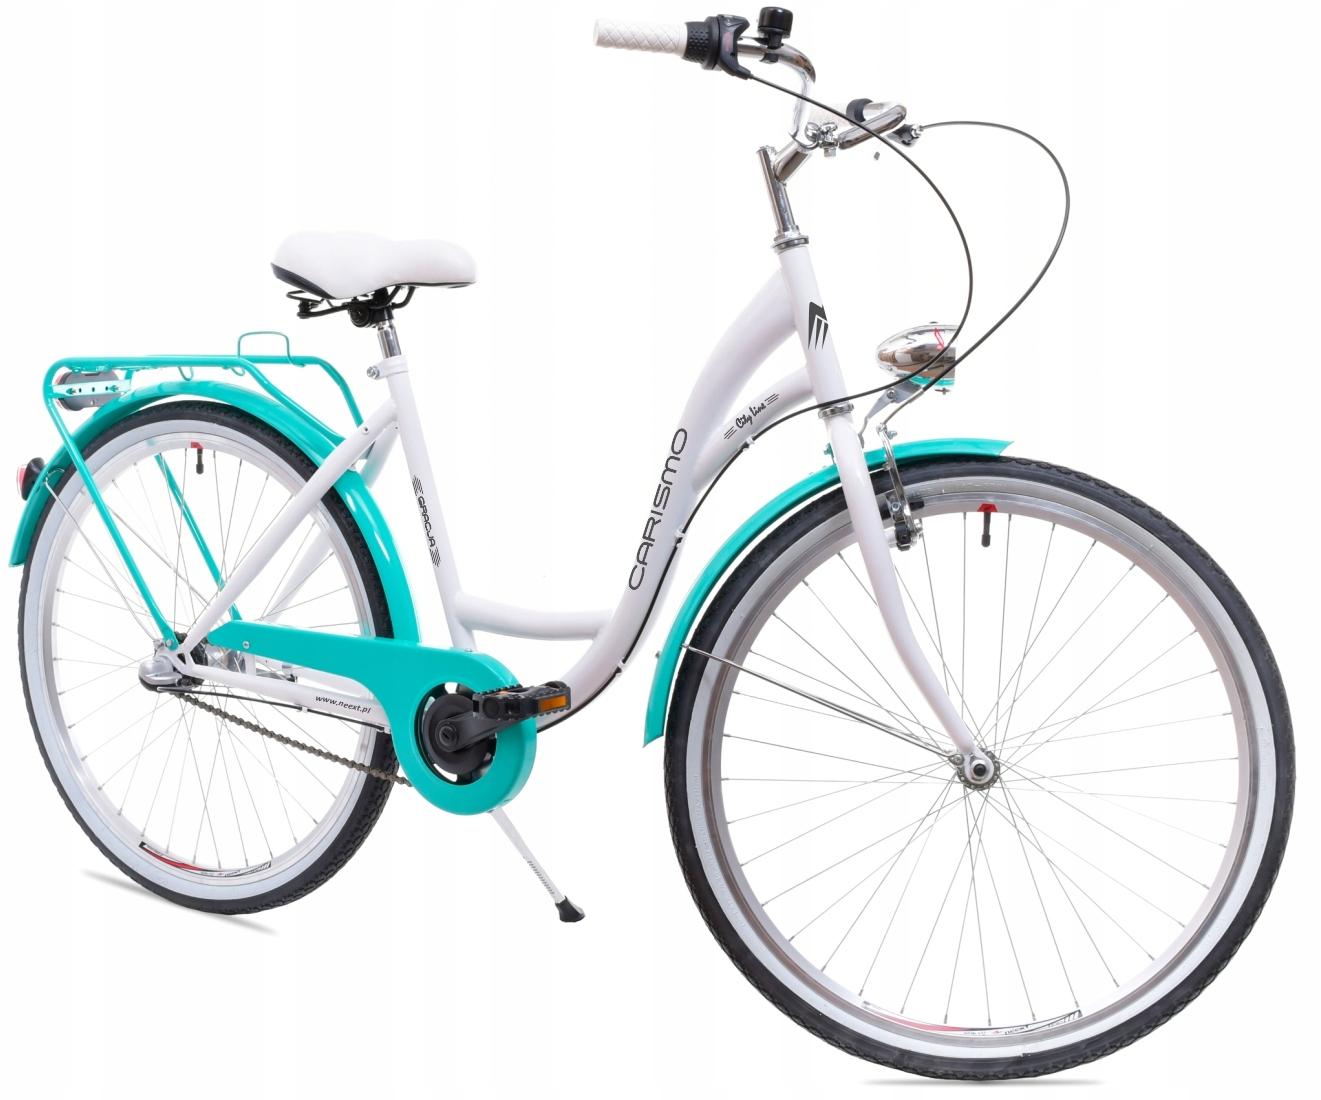 Dámsky mestský bicykel GRACJA 26 Shimano 3b Dutchman Veľkosť rámu 17,5 palca